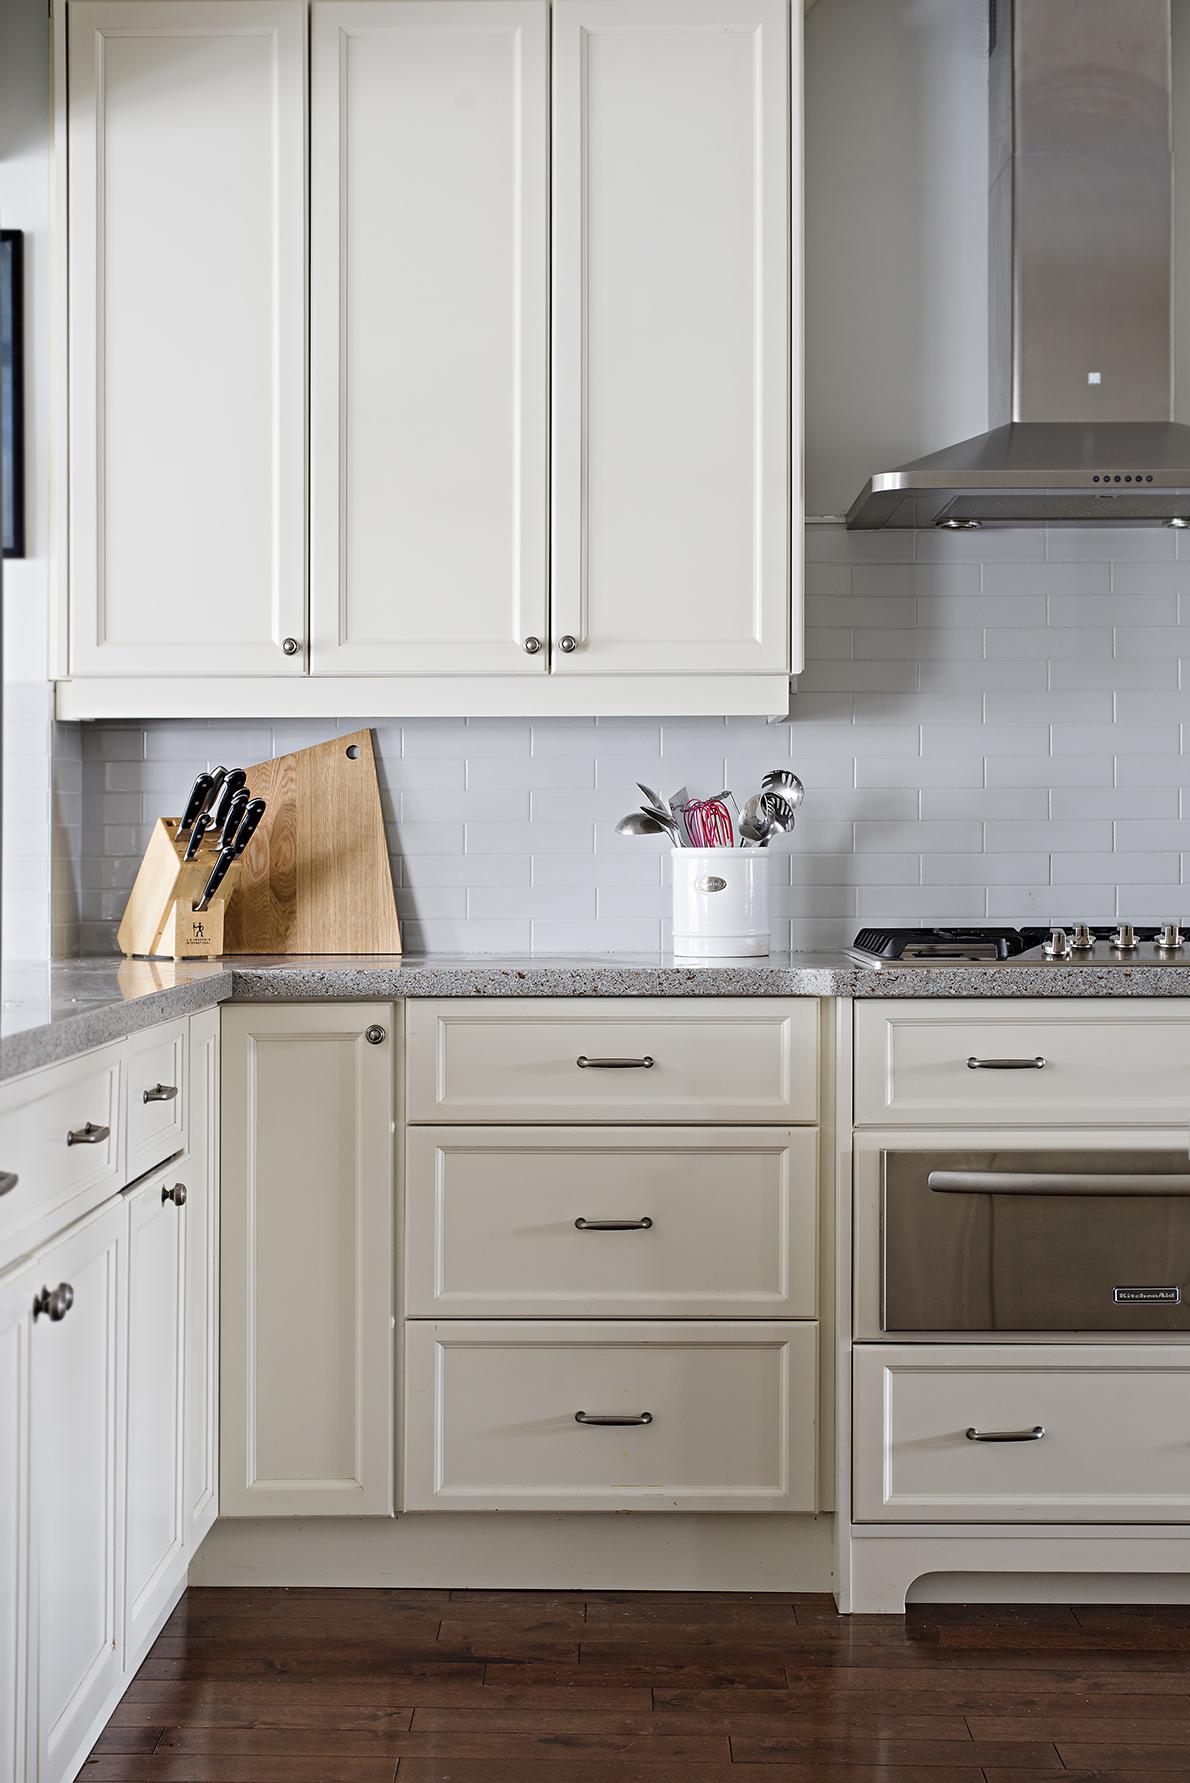 Kitchen with wood flooring, white cabinets and tiled backsplash